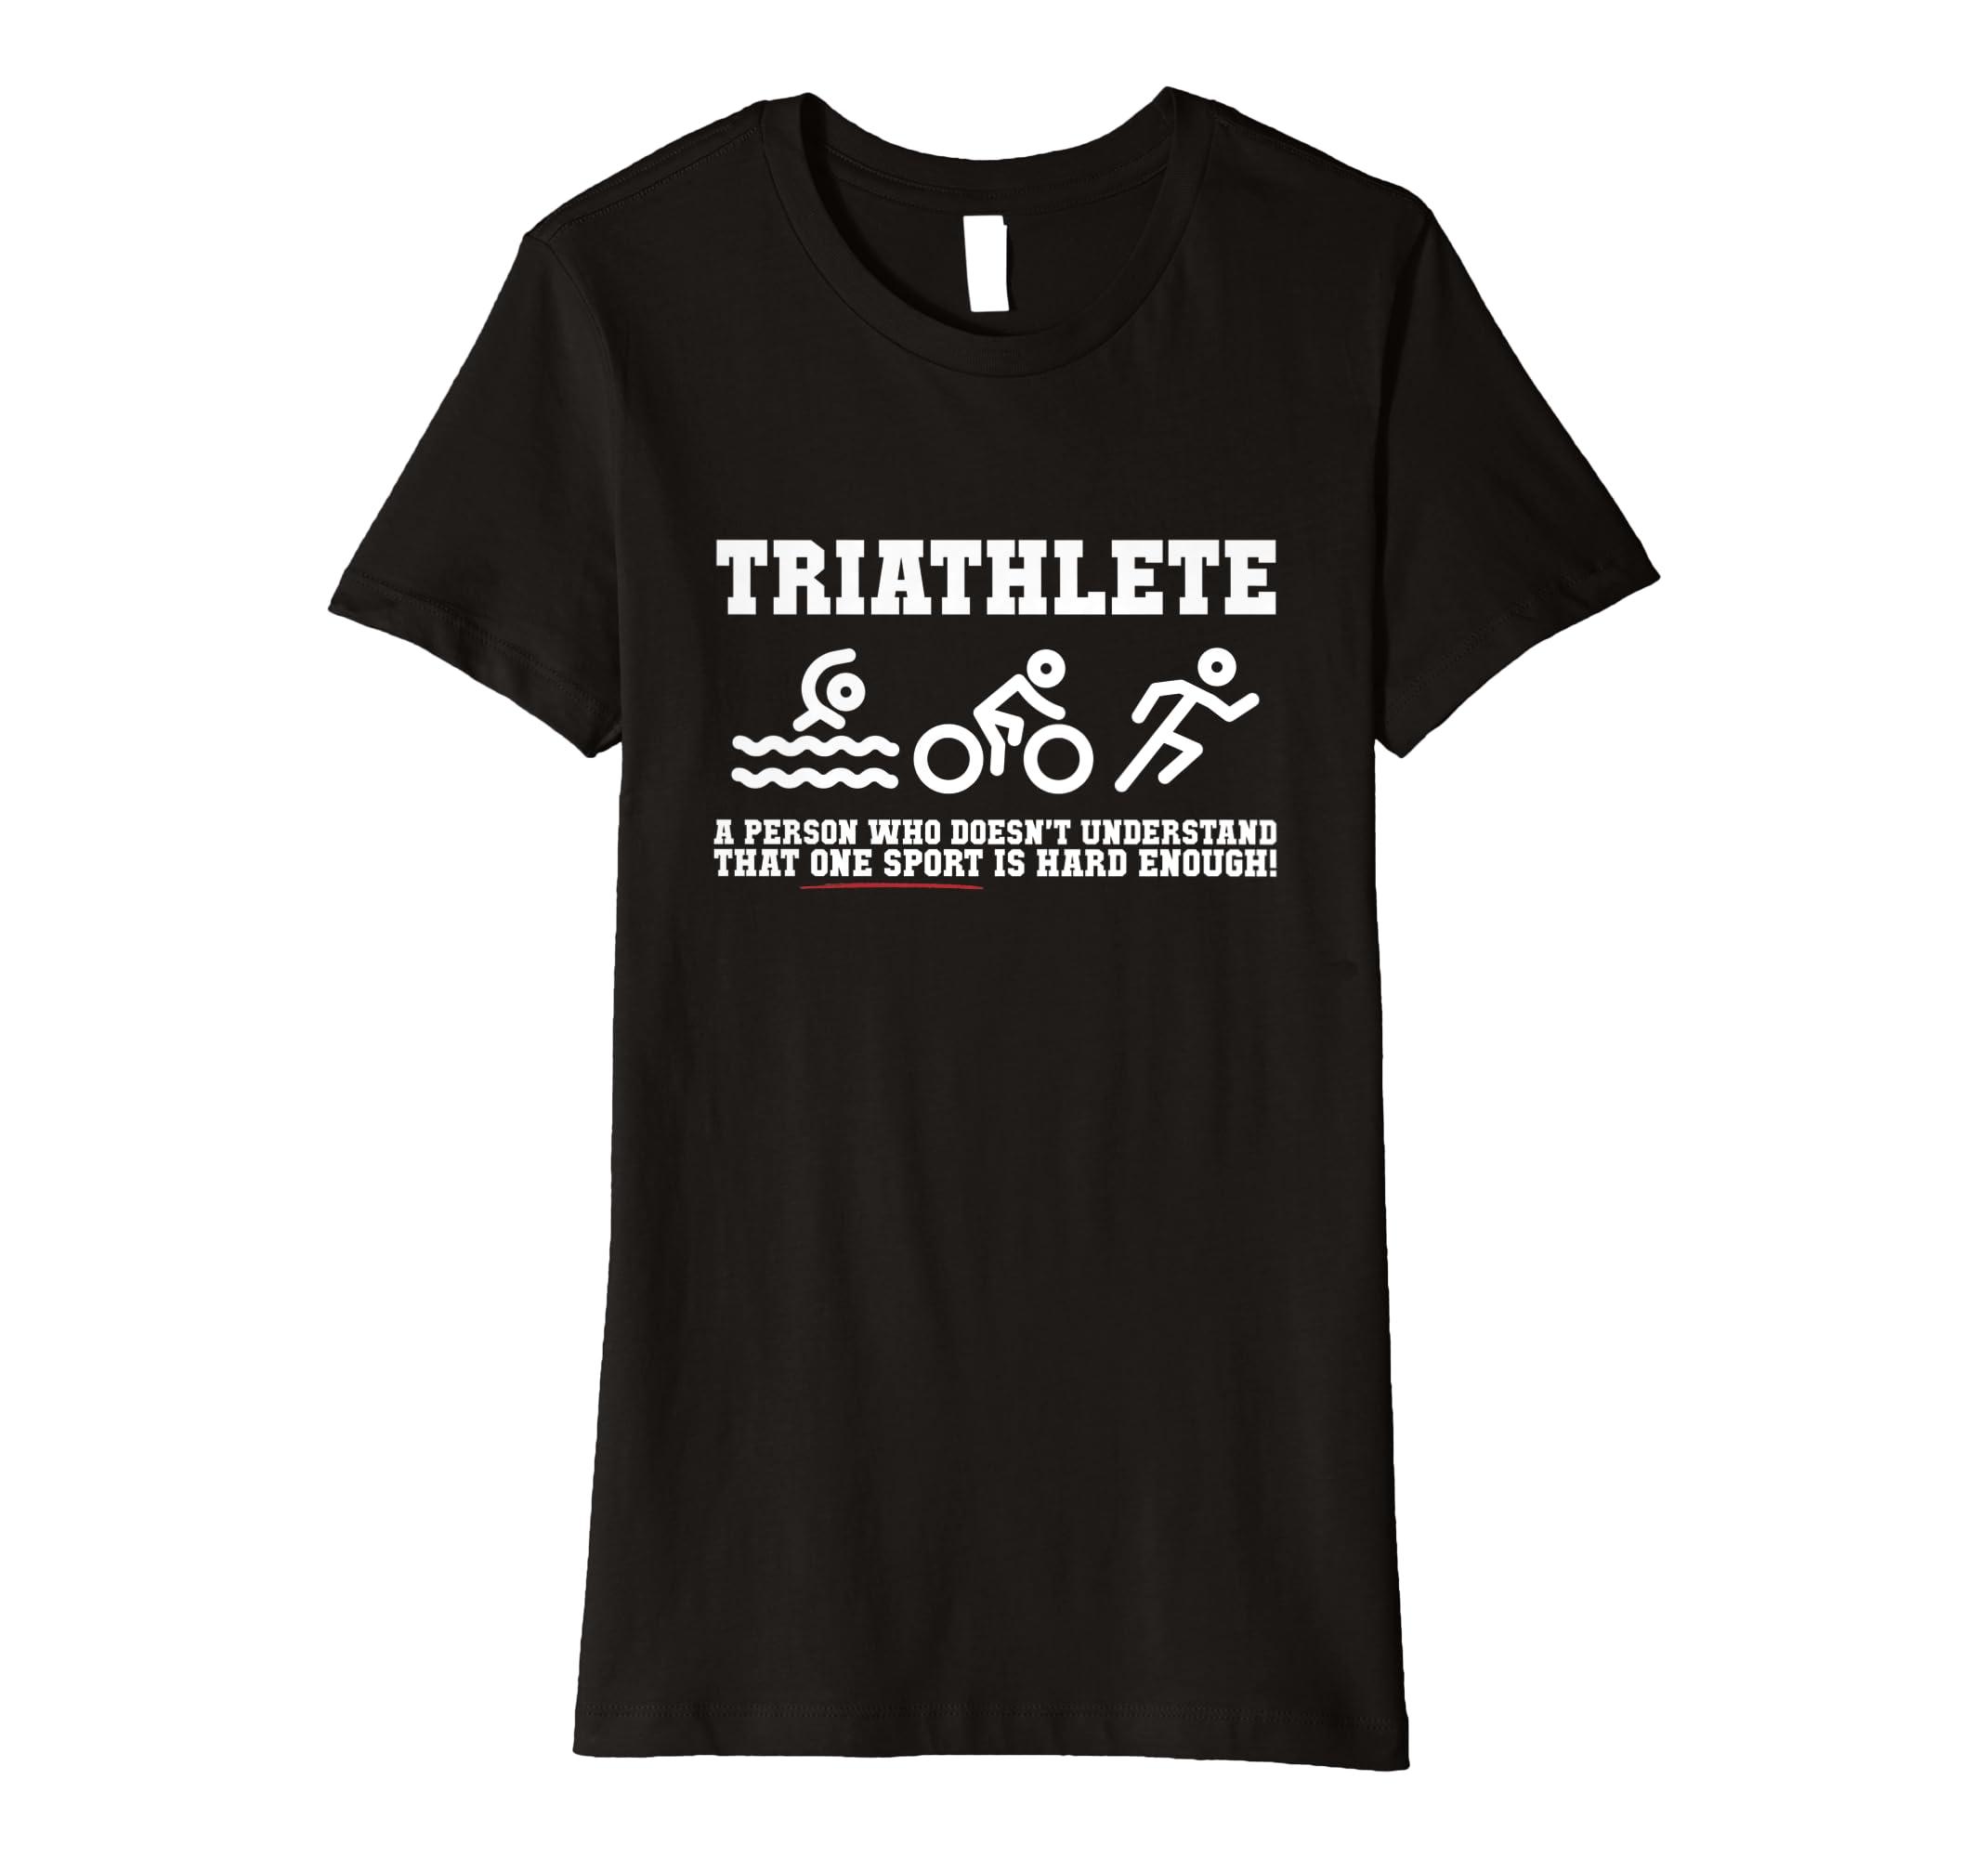 4e4c6e27 Amazon.com: Triathlon Shirt - Swim Bike Run Triathlete Tee: Clothing